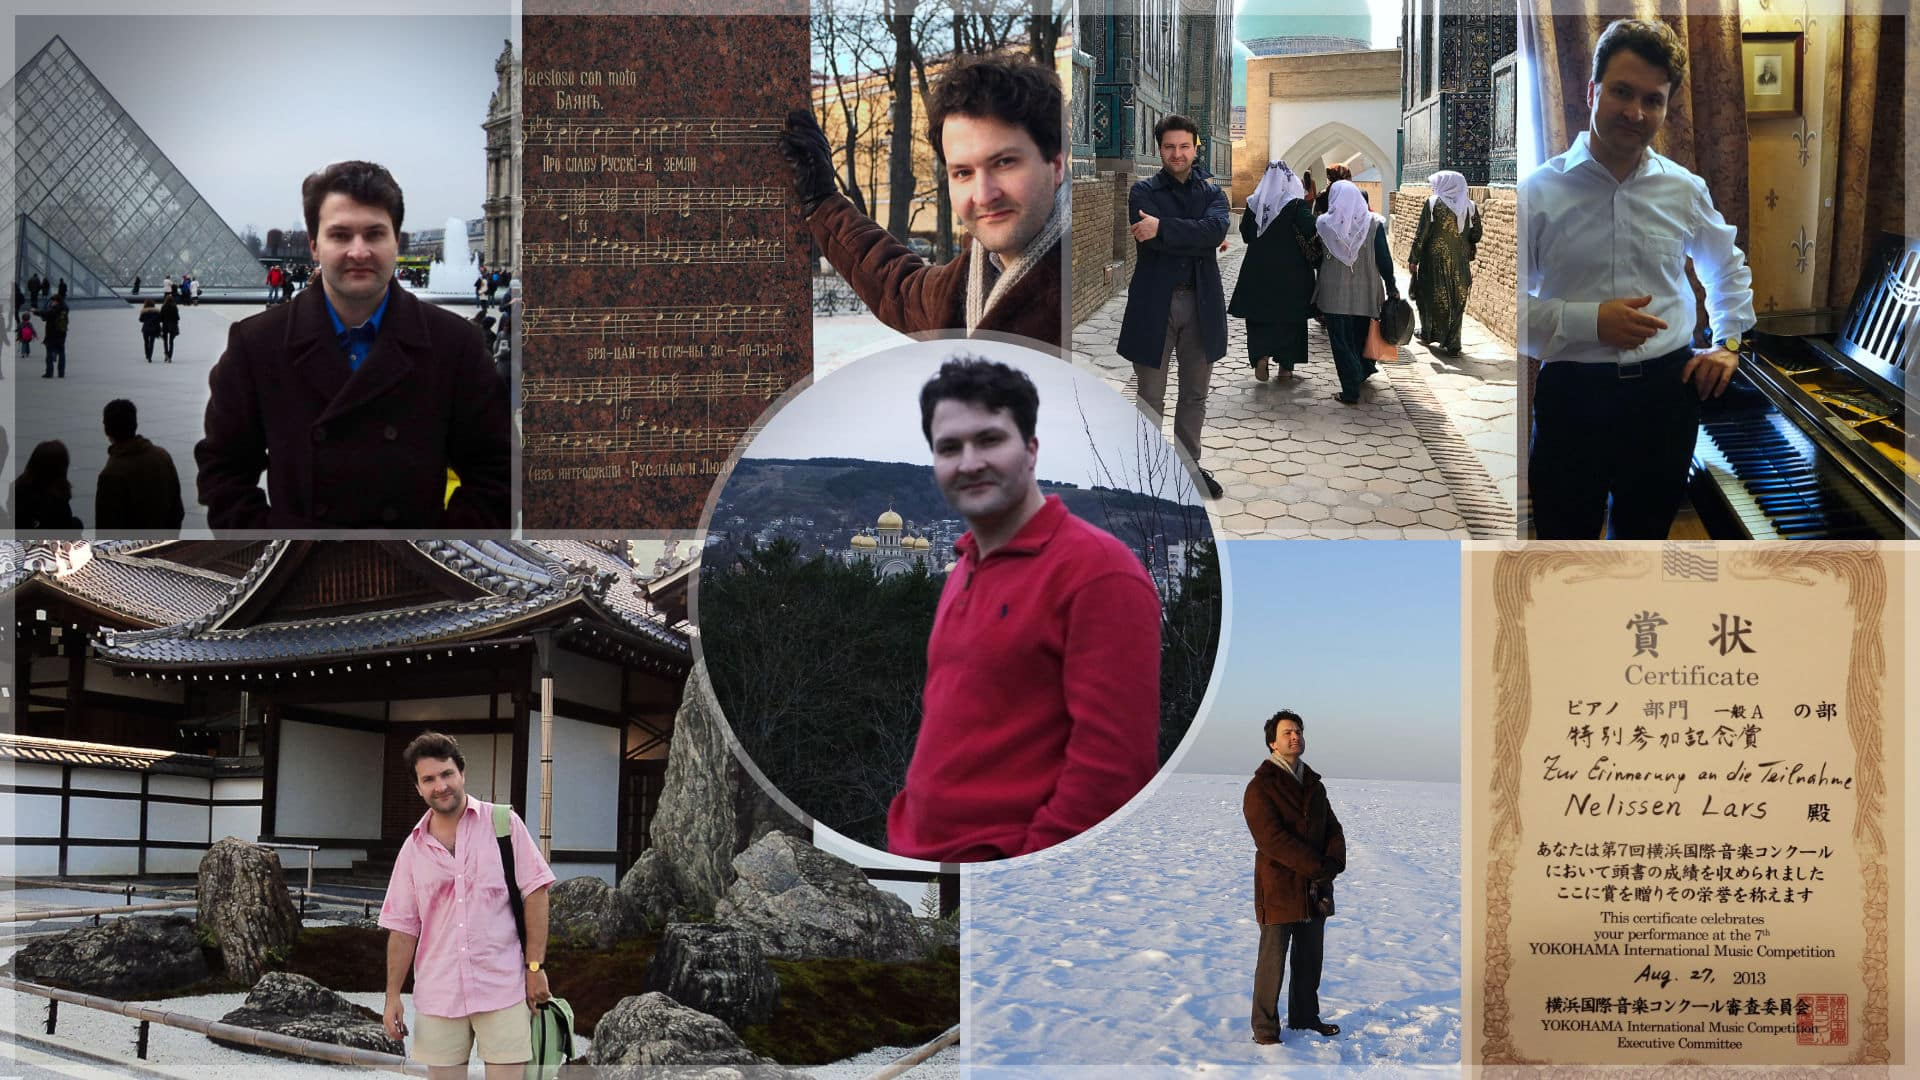 Collage after study Lars Nelissen